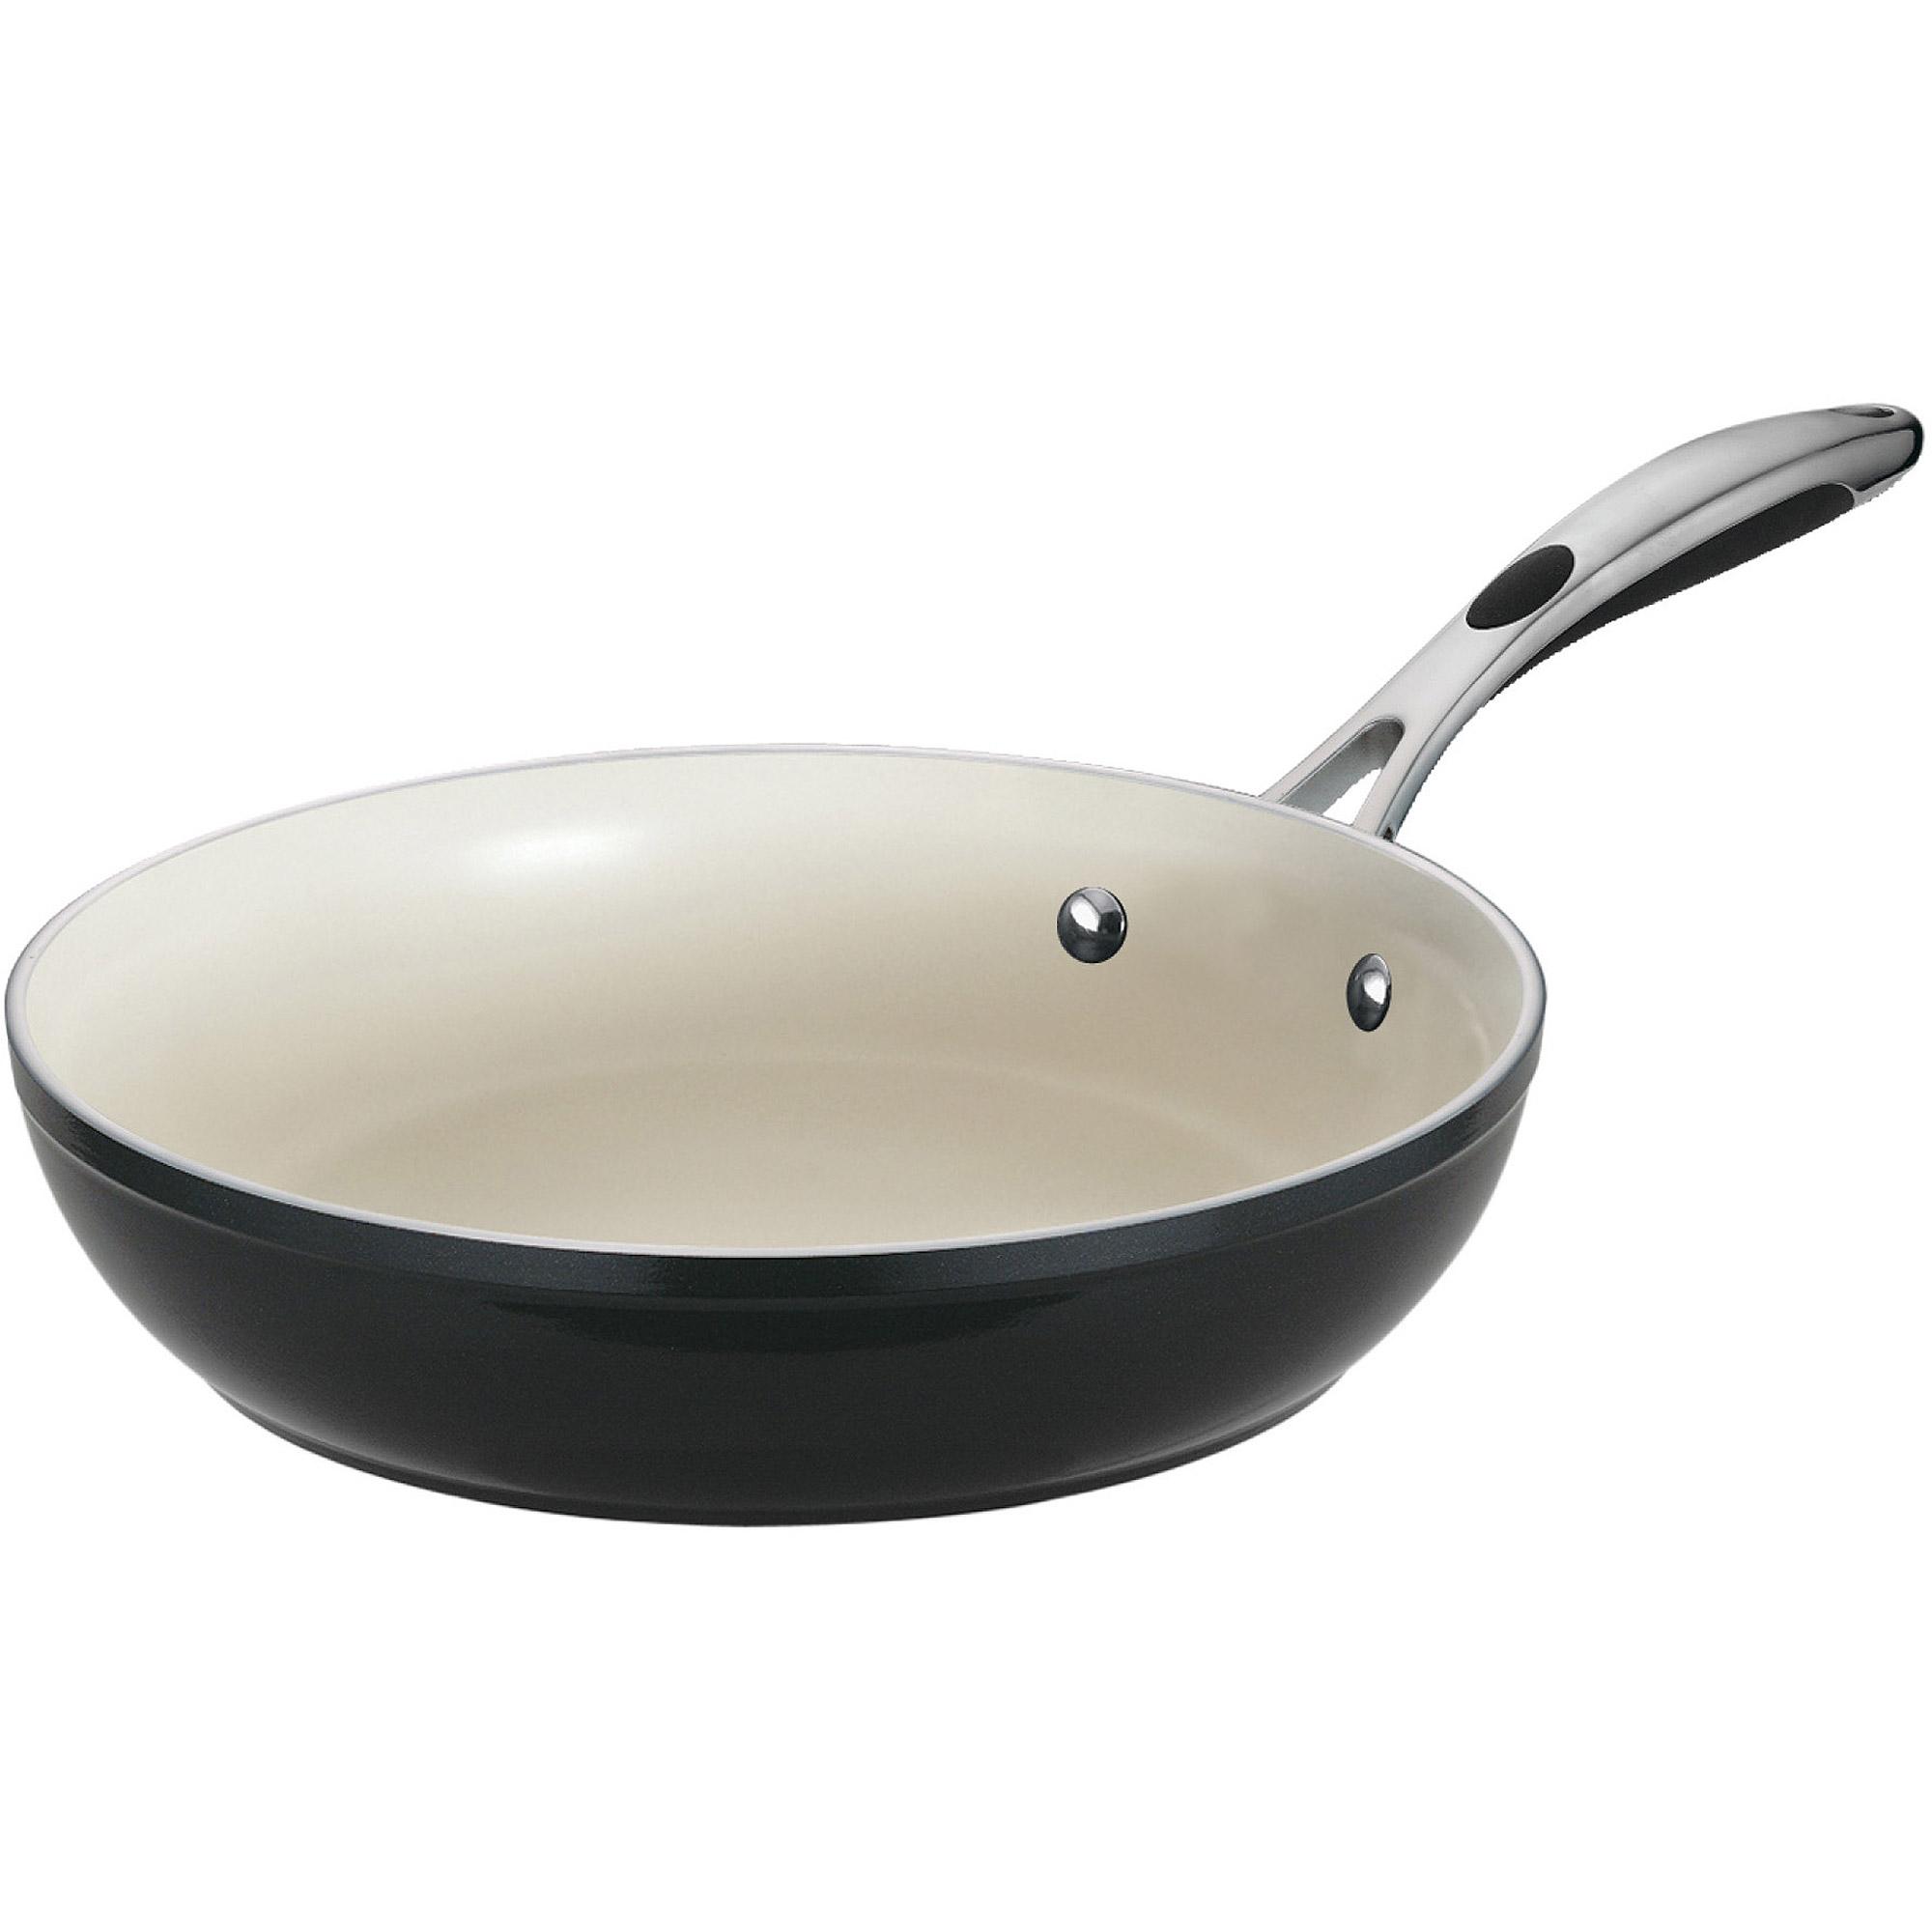 Tramontina Gourmet Ceramica_01 Deluxe 12 in Fry Pan, Black